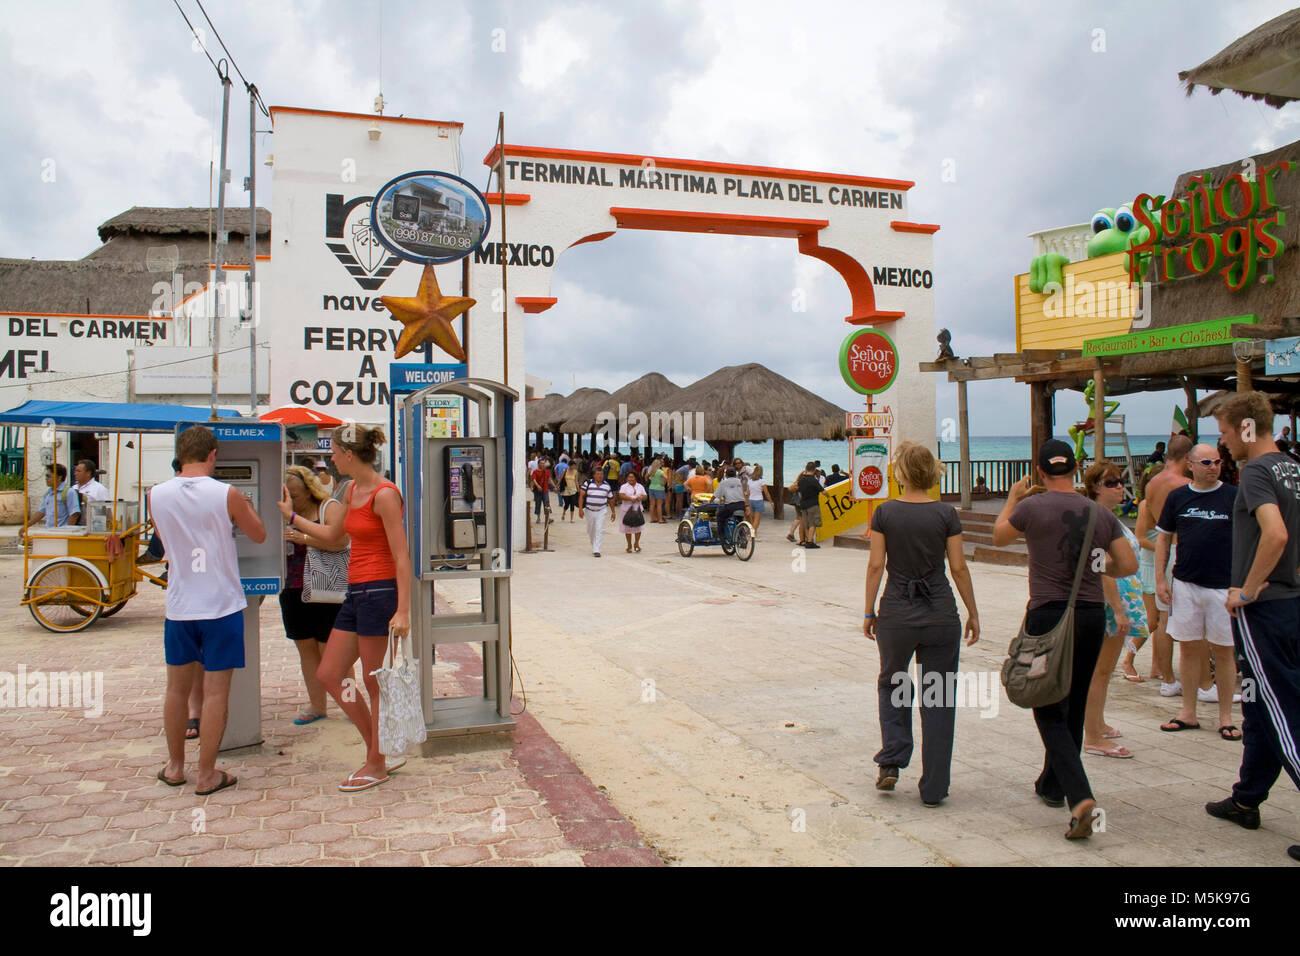 Terminal, Faehre nach Cozumel, Playa del Carmen, Mexiko, Karibik | Terminal, ferry to Cozumel, Playa del Carmen, - Stock Image